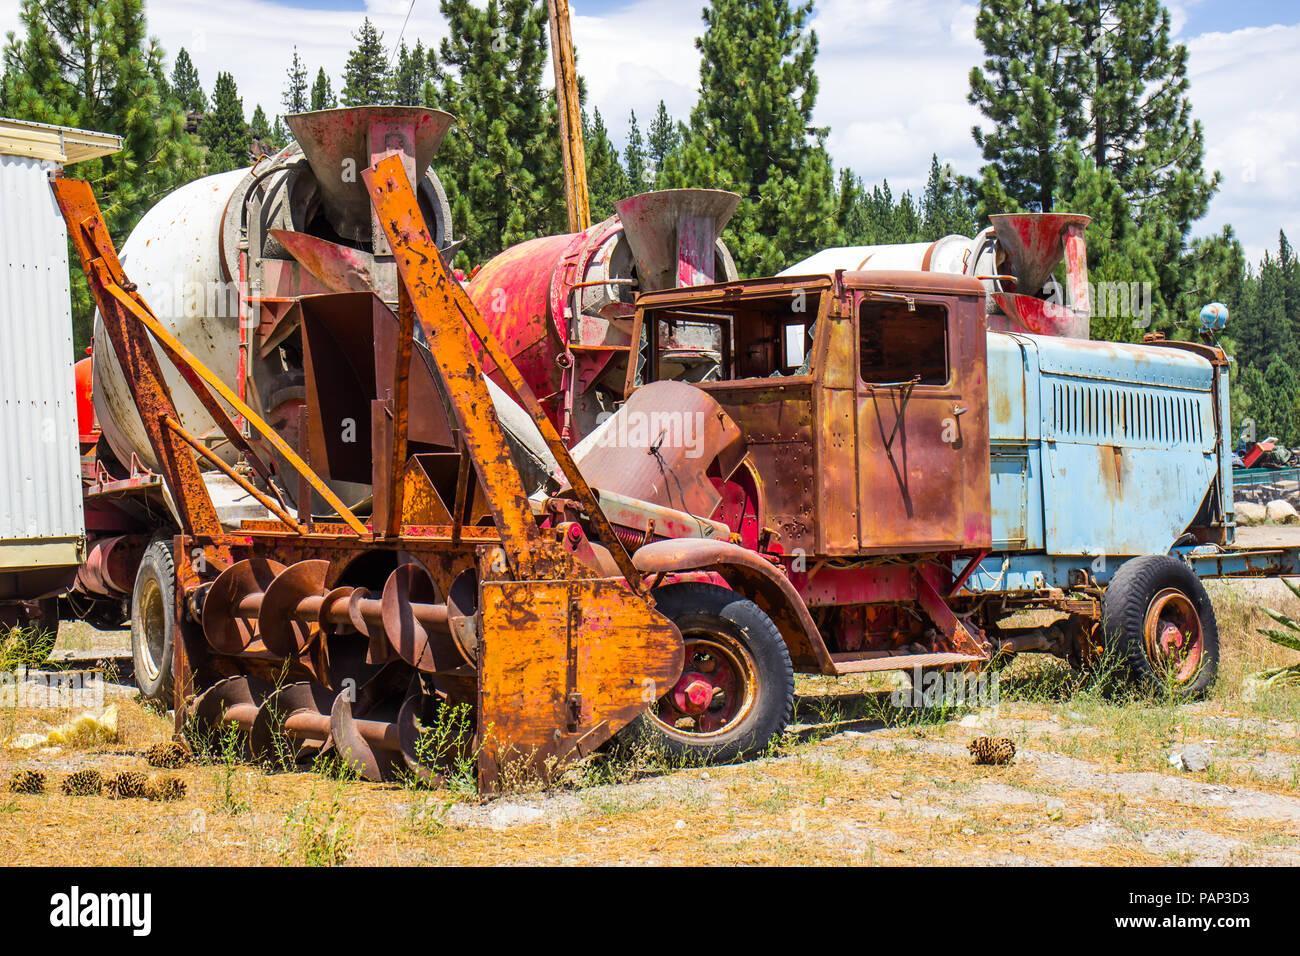 Vintage Snow Blower Truck In Salvage Yard Stock Photo